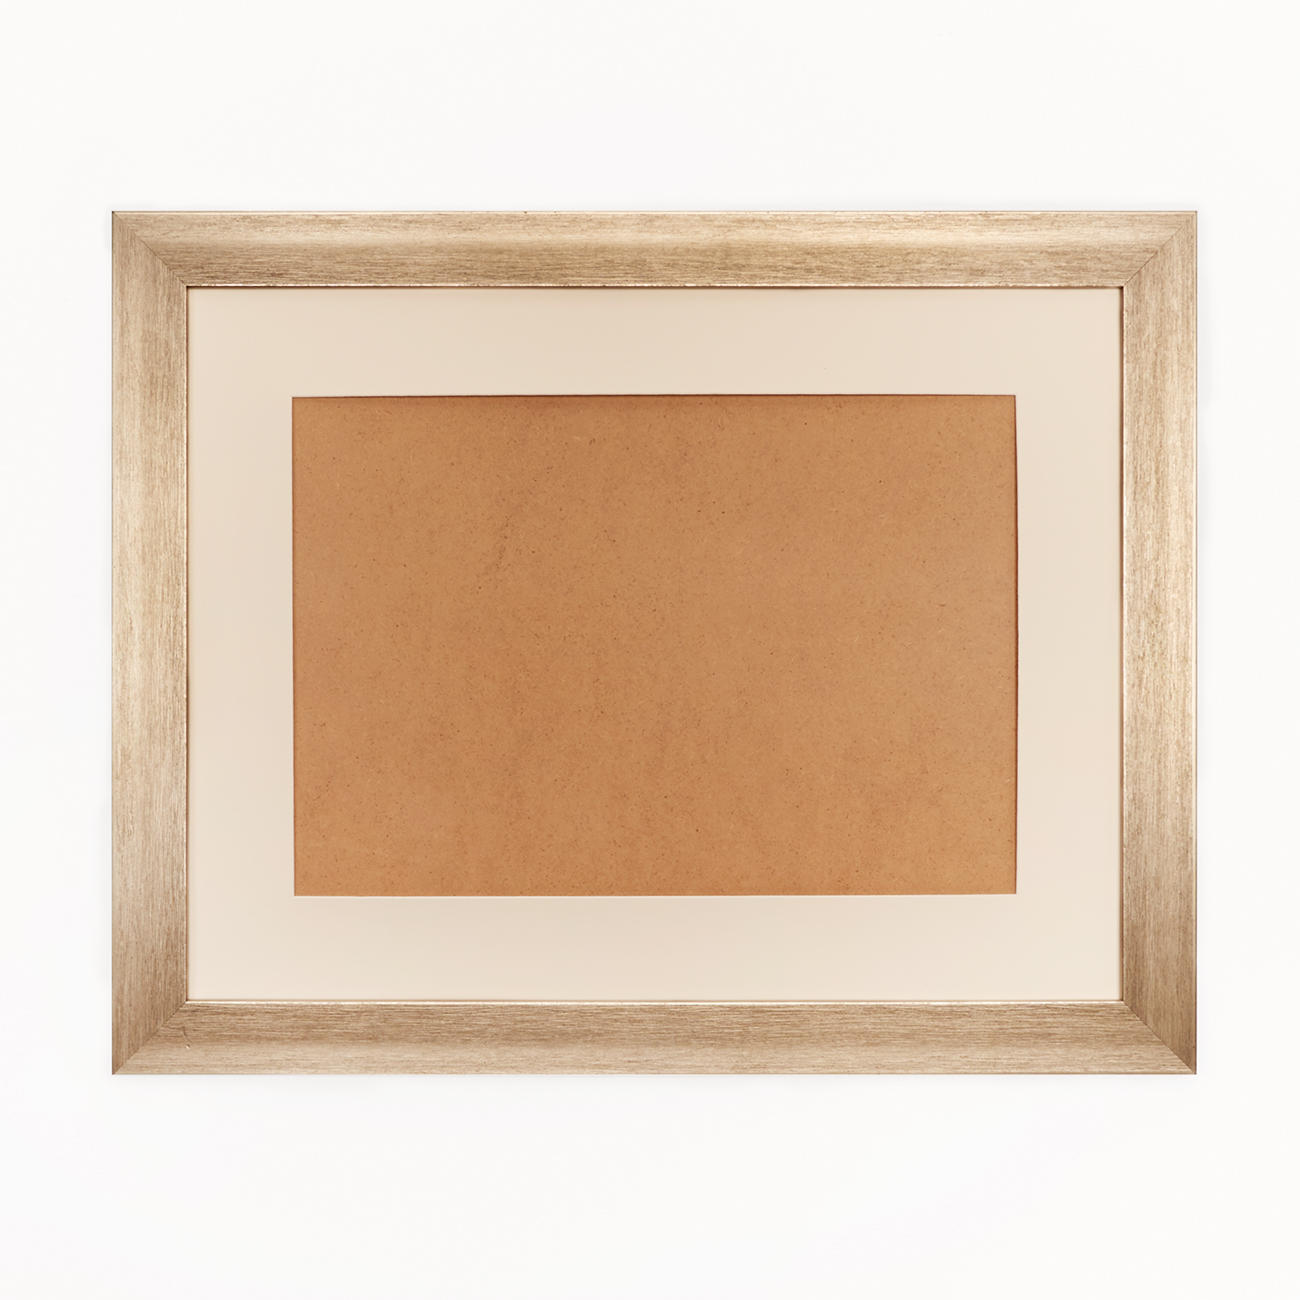 bilderrahmen blass goldfarben mit passepartout. Black Bedroom Furniture Sets. Home Design Ideas